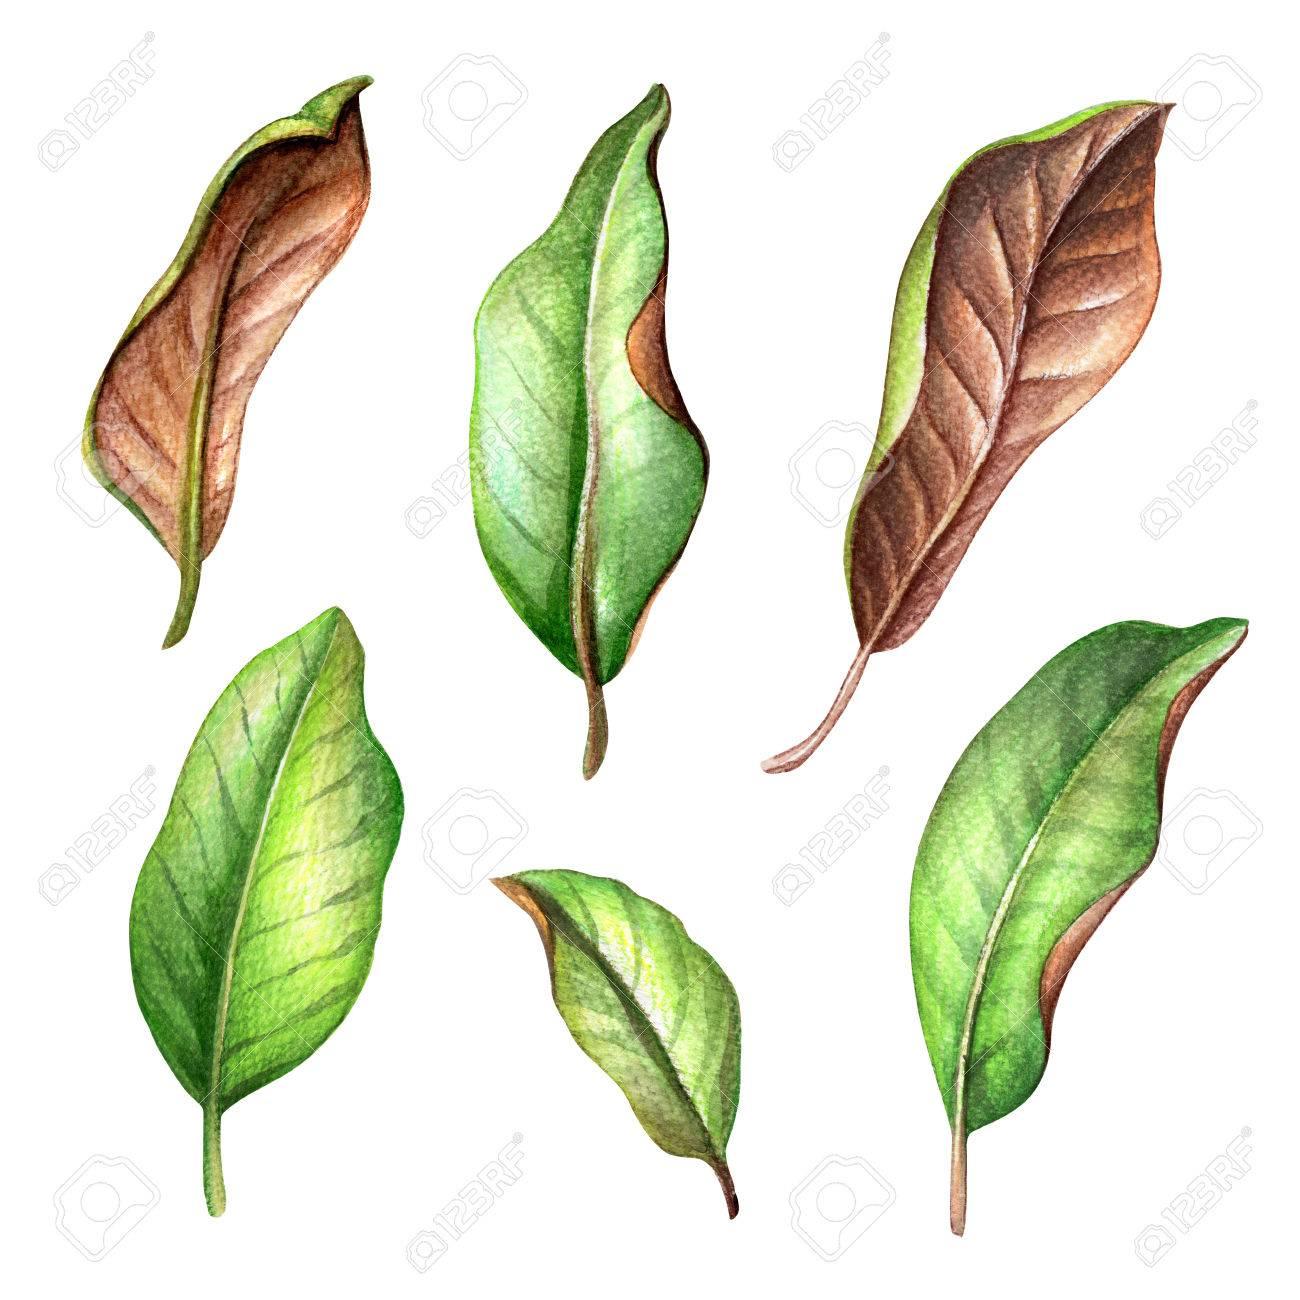 Watercolor Botanical Illustration Magnolia Tree Green Leaves